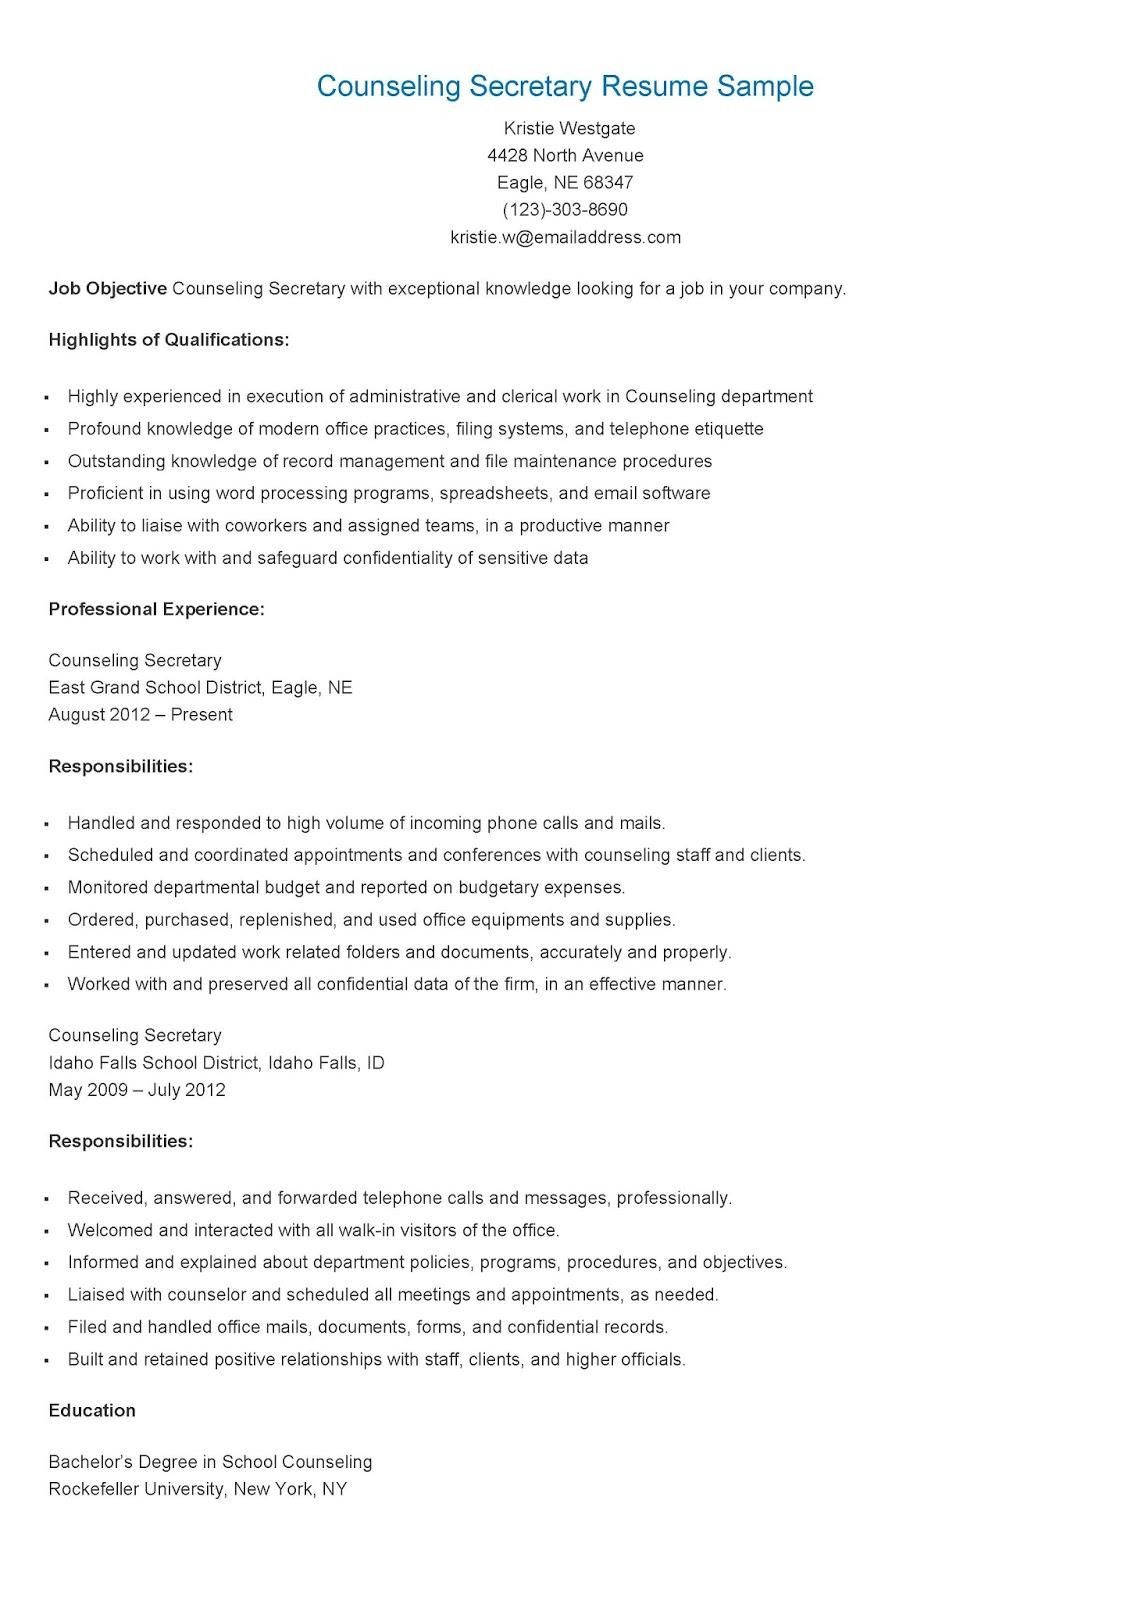 Resume Samples Counseling Secretary Resume Sample